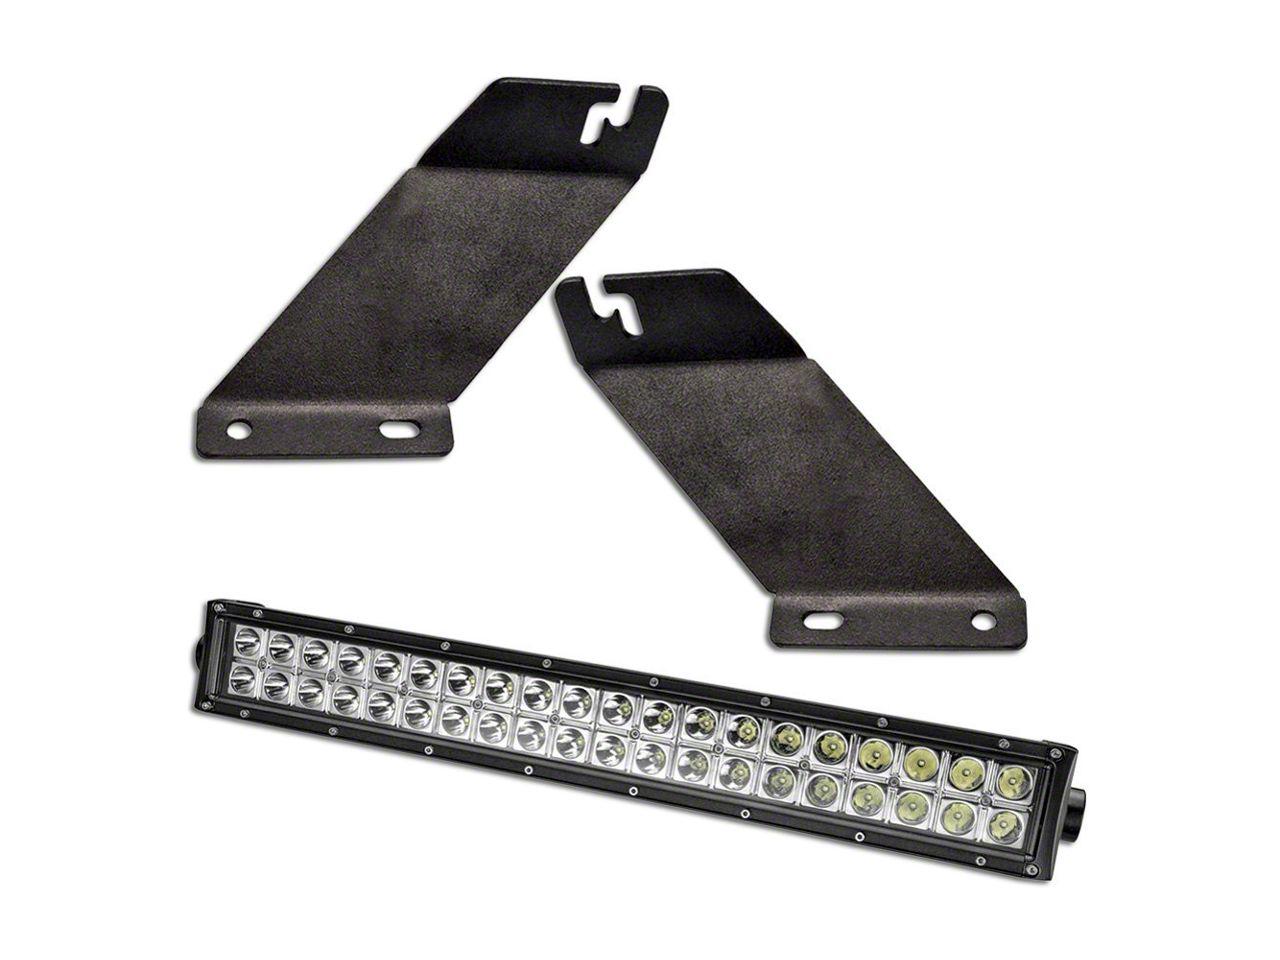 Oracle 22 in. LED Light Bar w/ Hood Mounting Brackets (07-18 Jeep Wrangler JK)